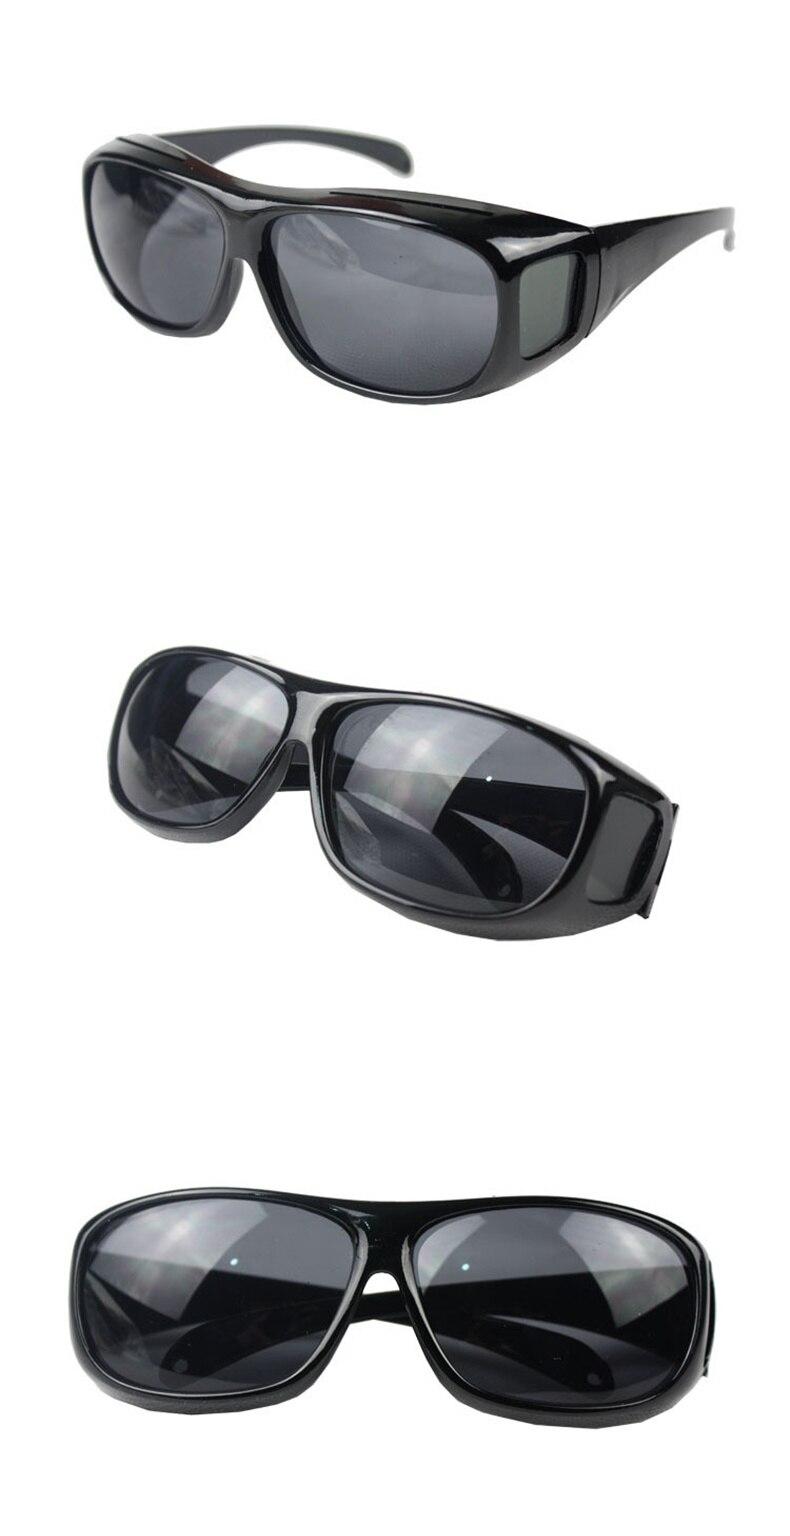 oculos para dirigir